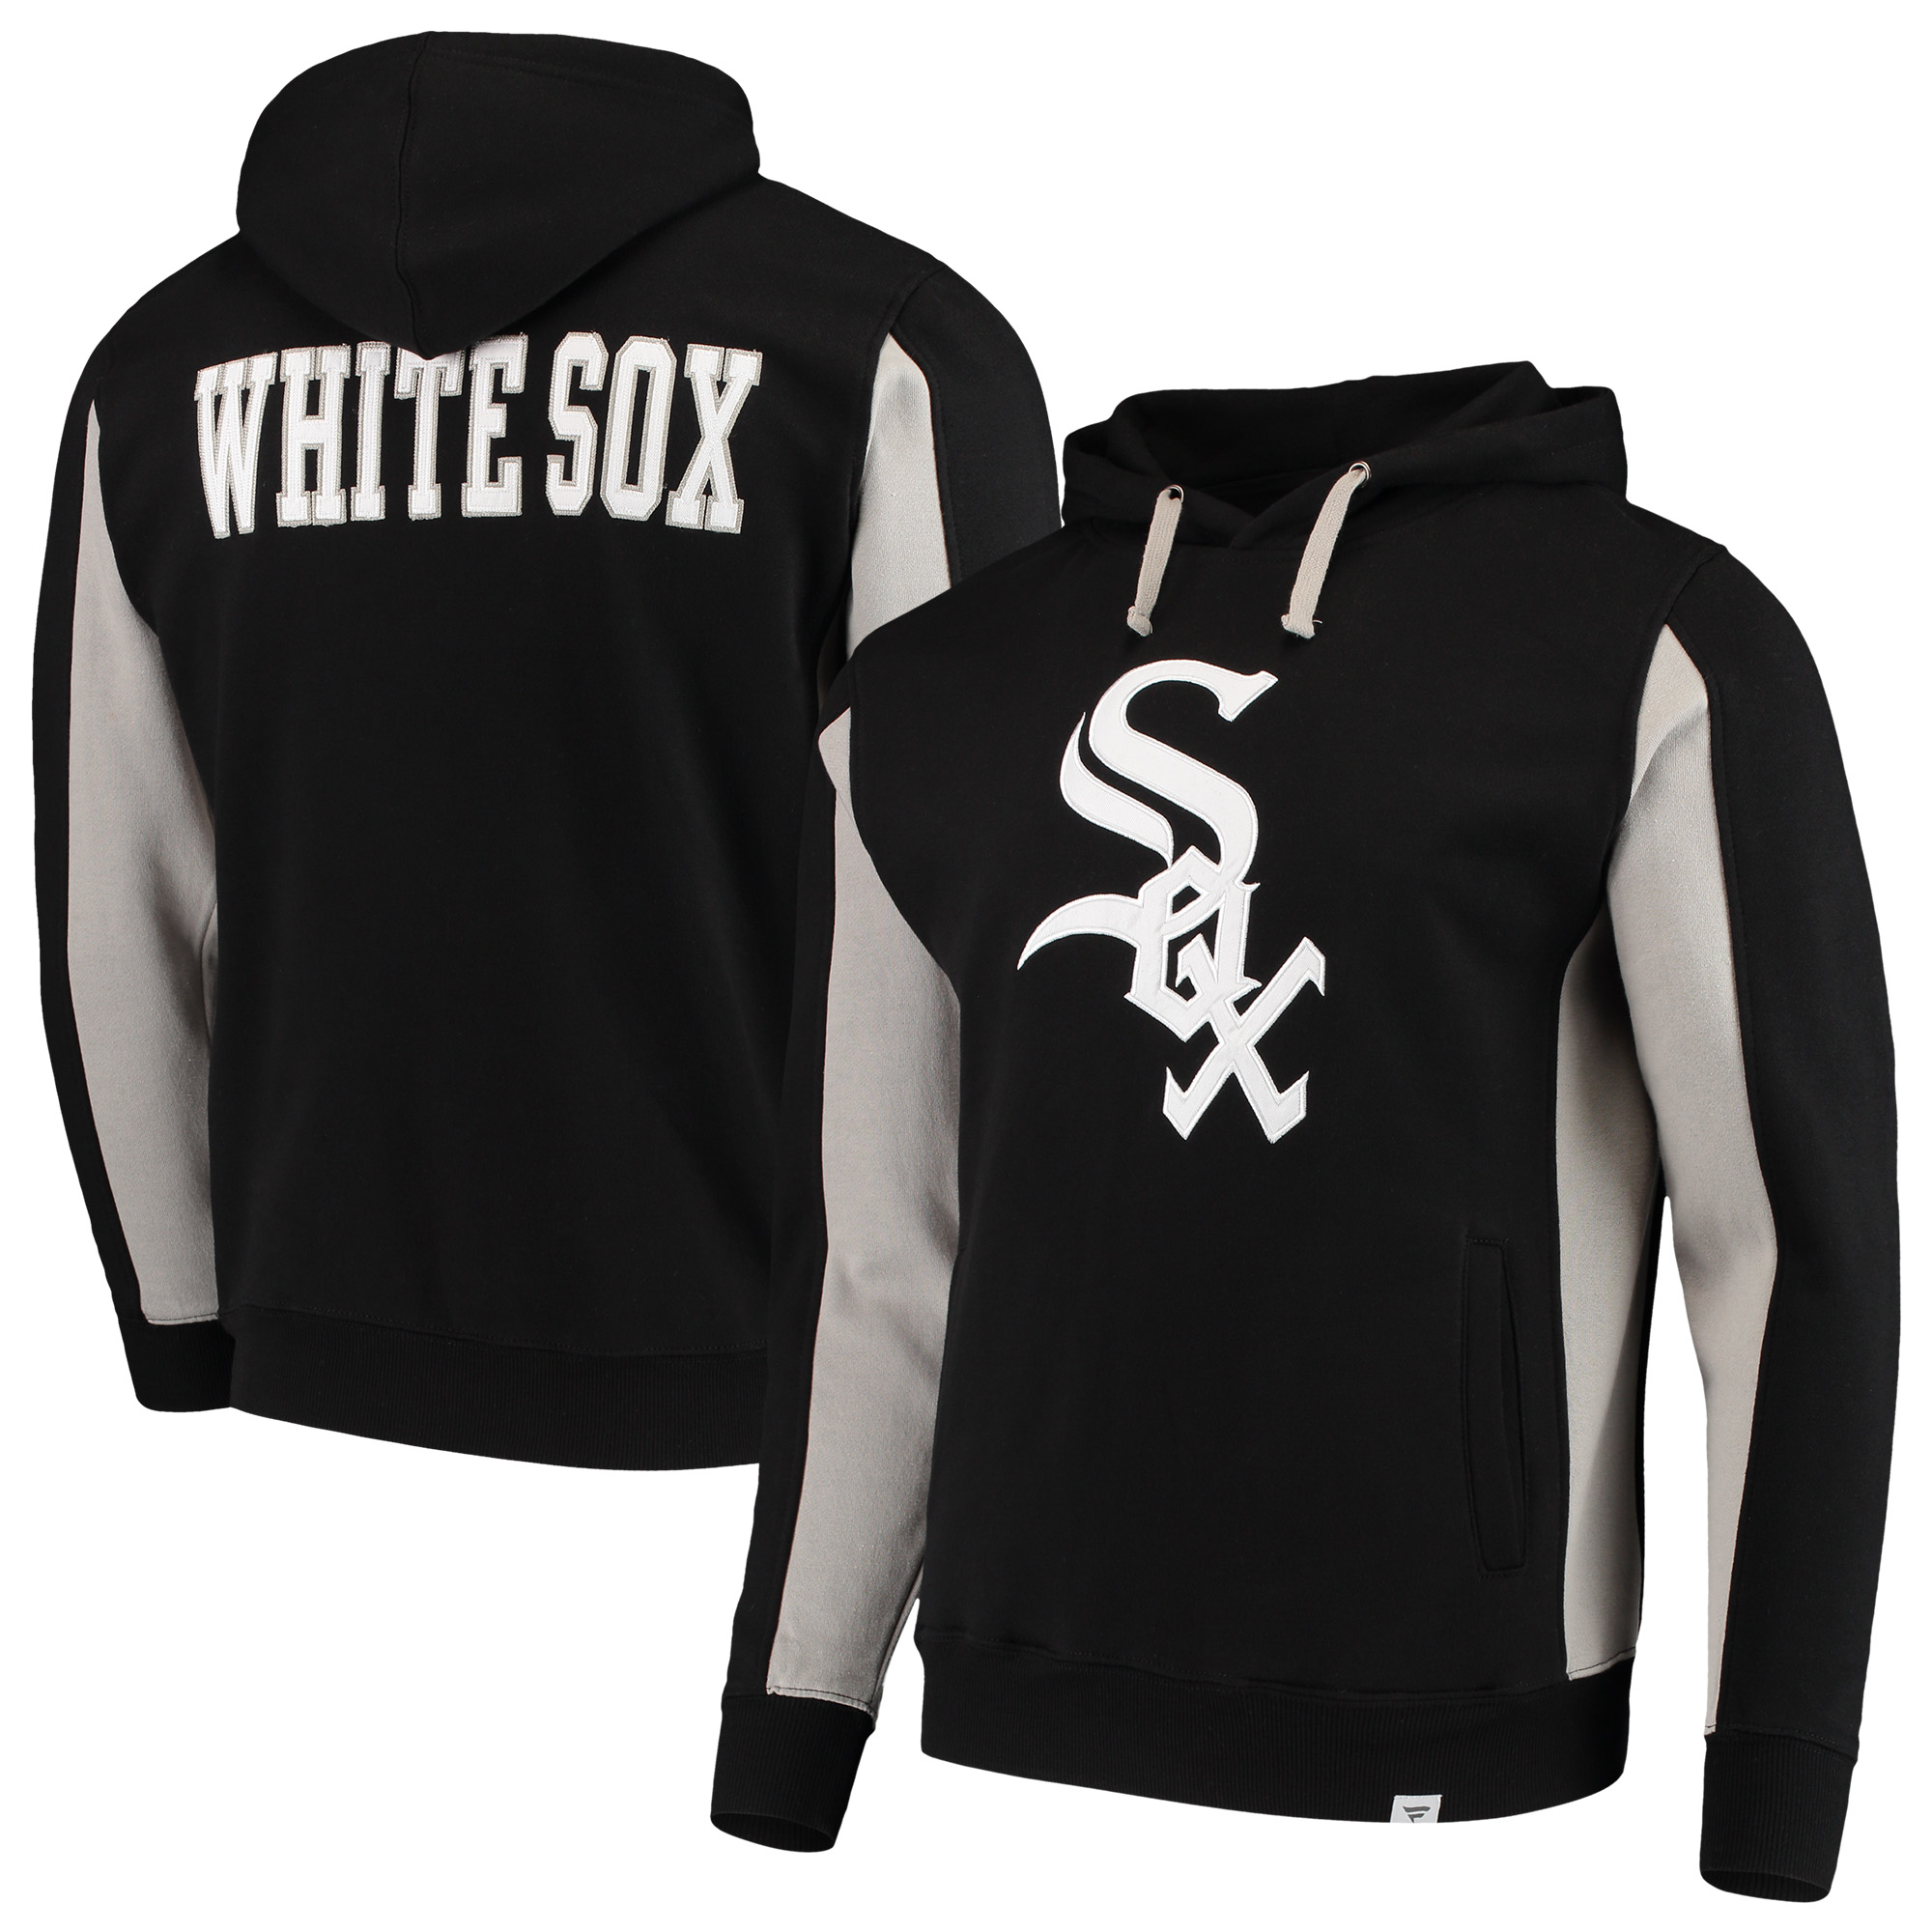 Chicago White Sox Fanatics Branded Team Logo Iconic Fleece Pullover Hoodie - Black/White